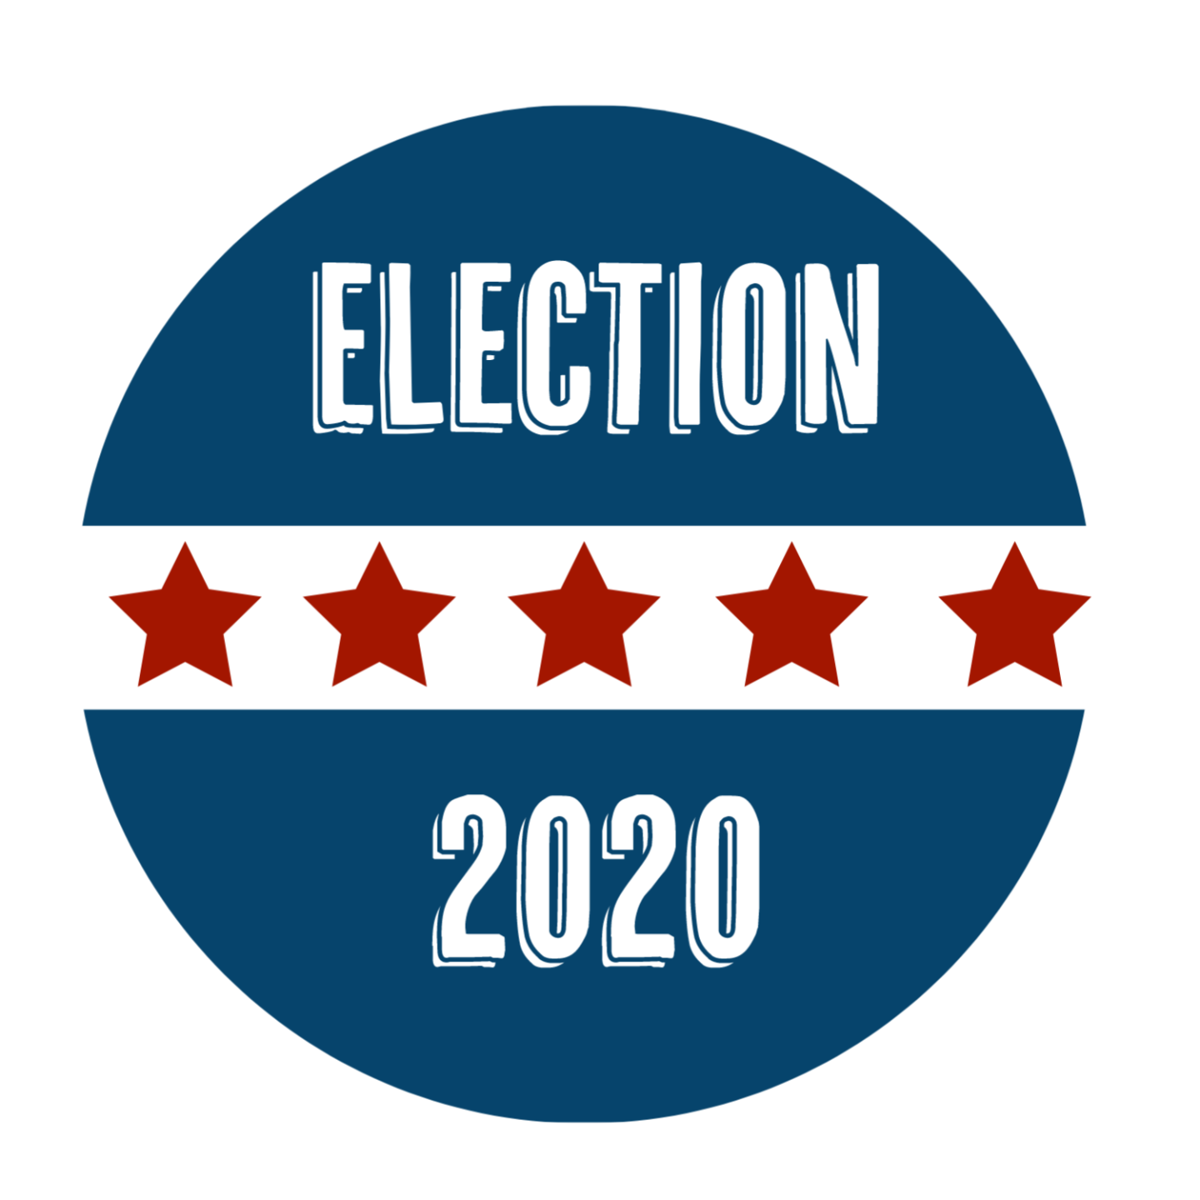 Election logo 2020 IPT